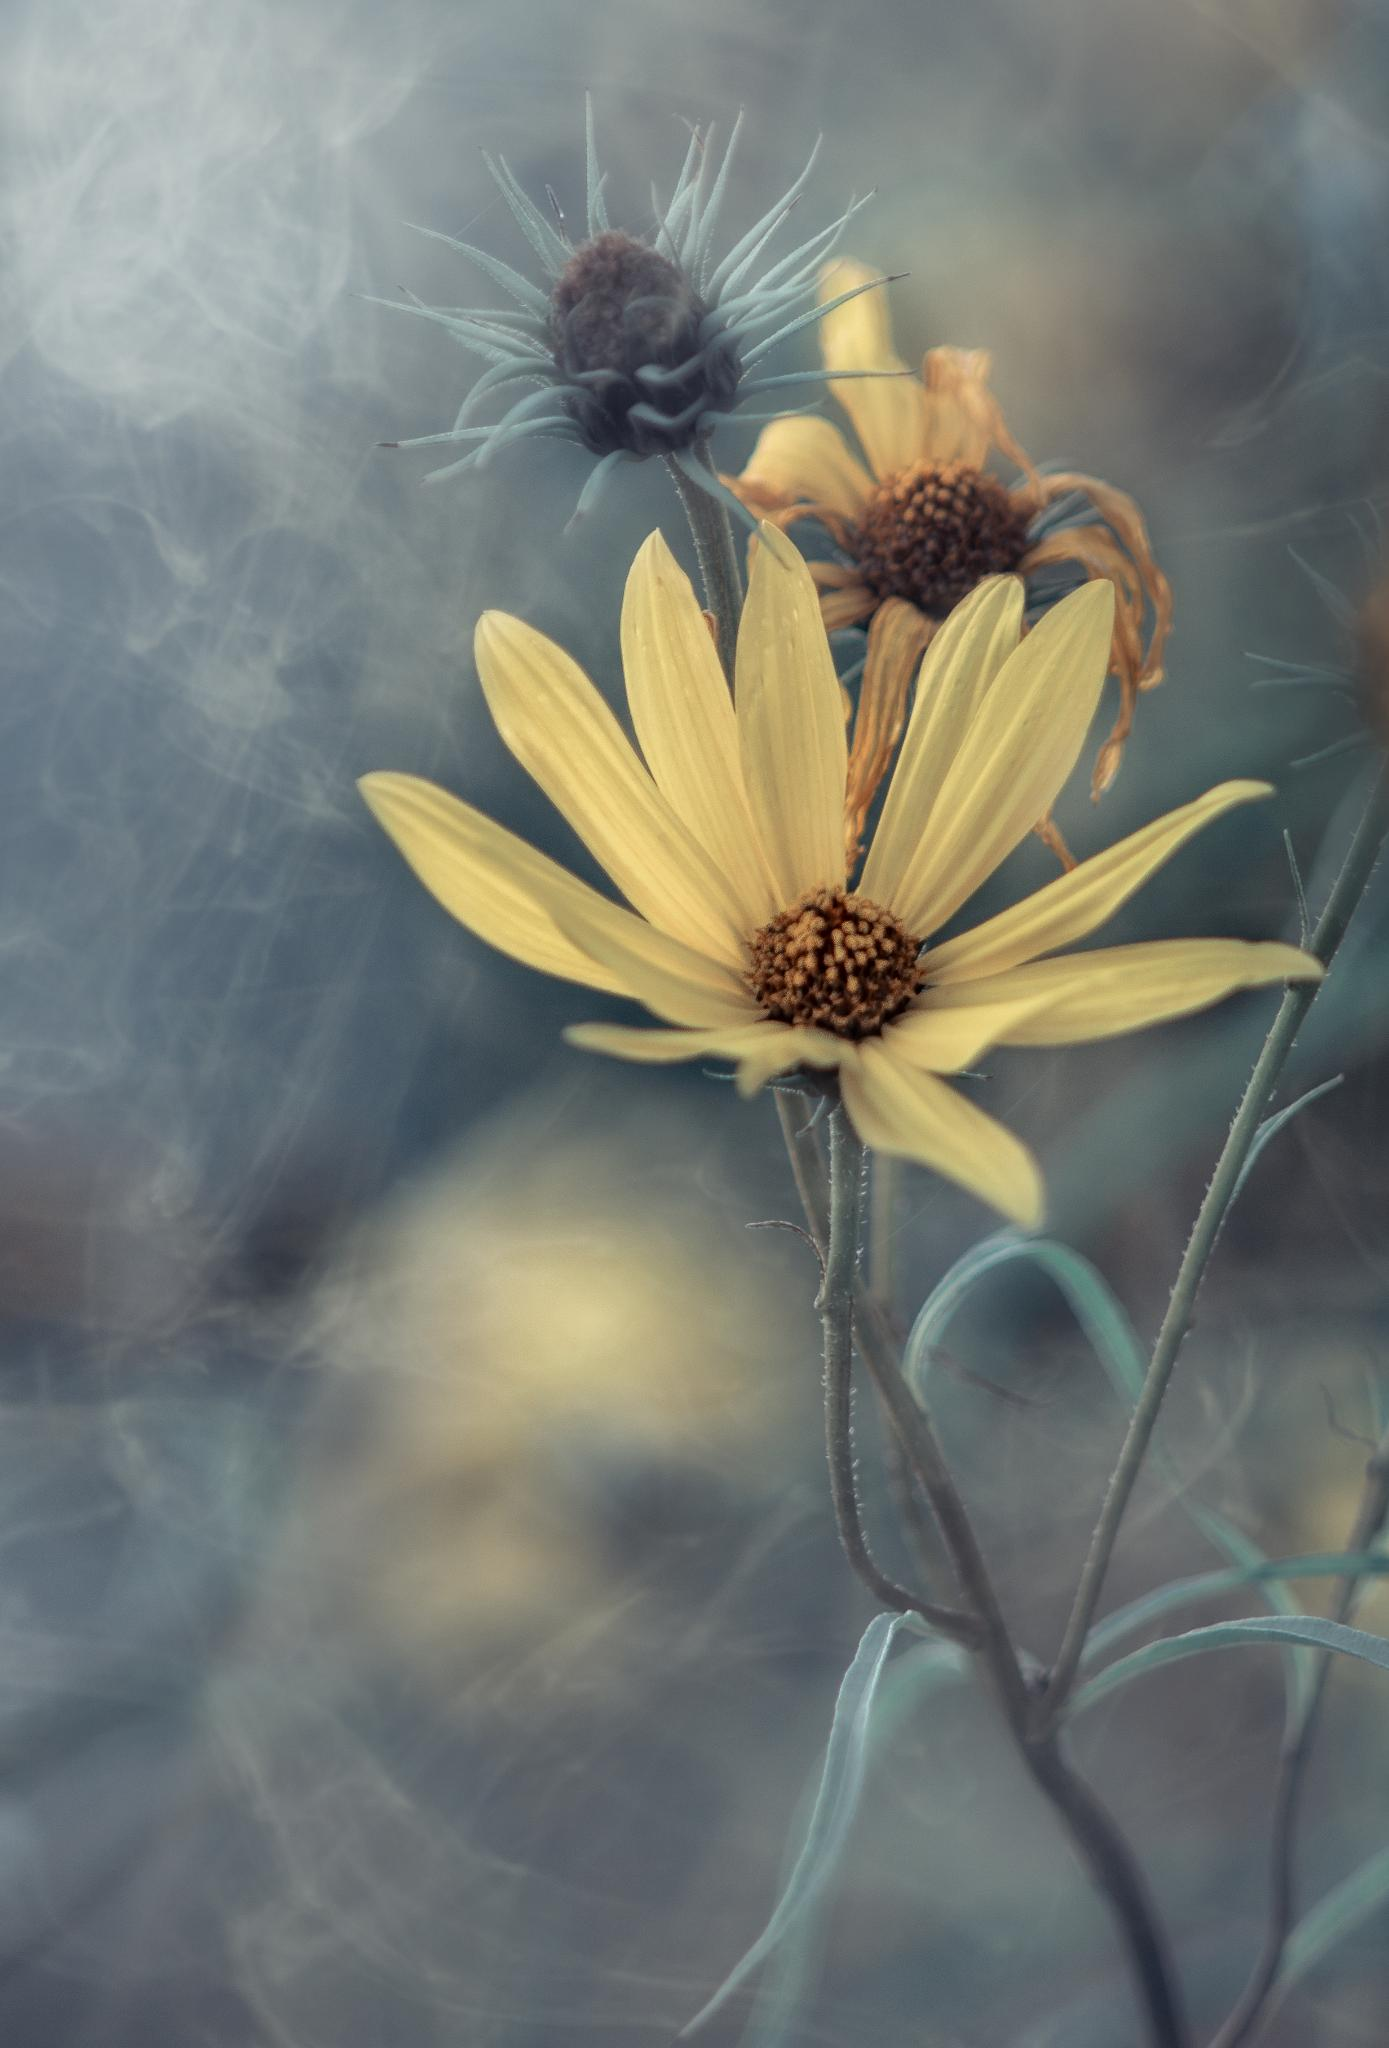 on a foggy day by Michael Wipperfürth